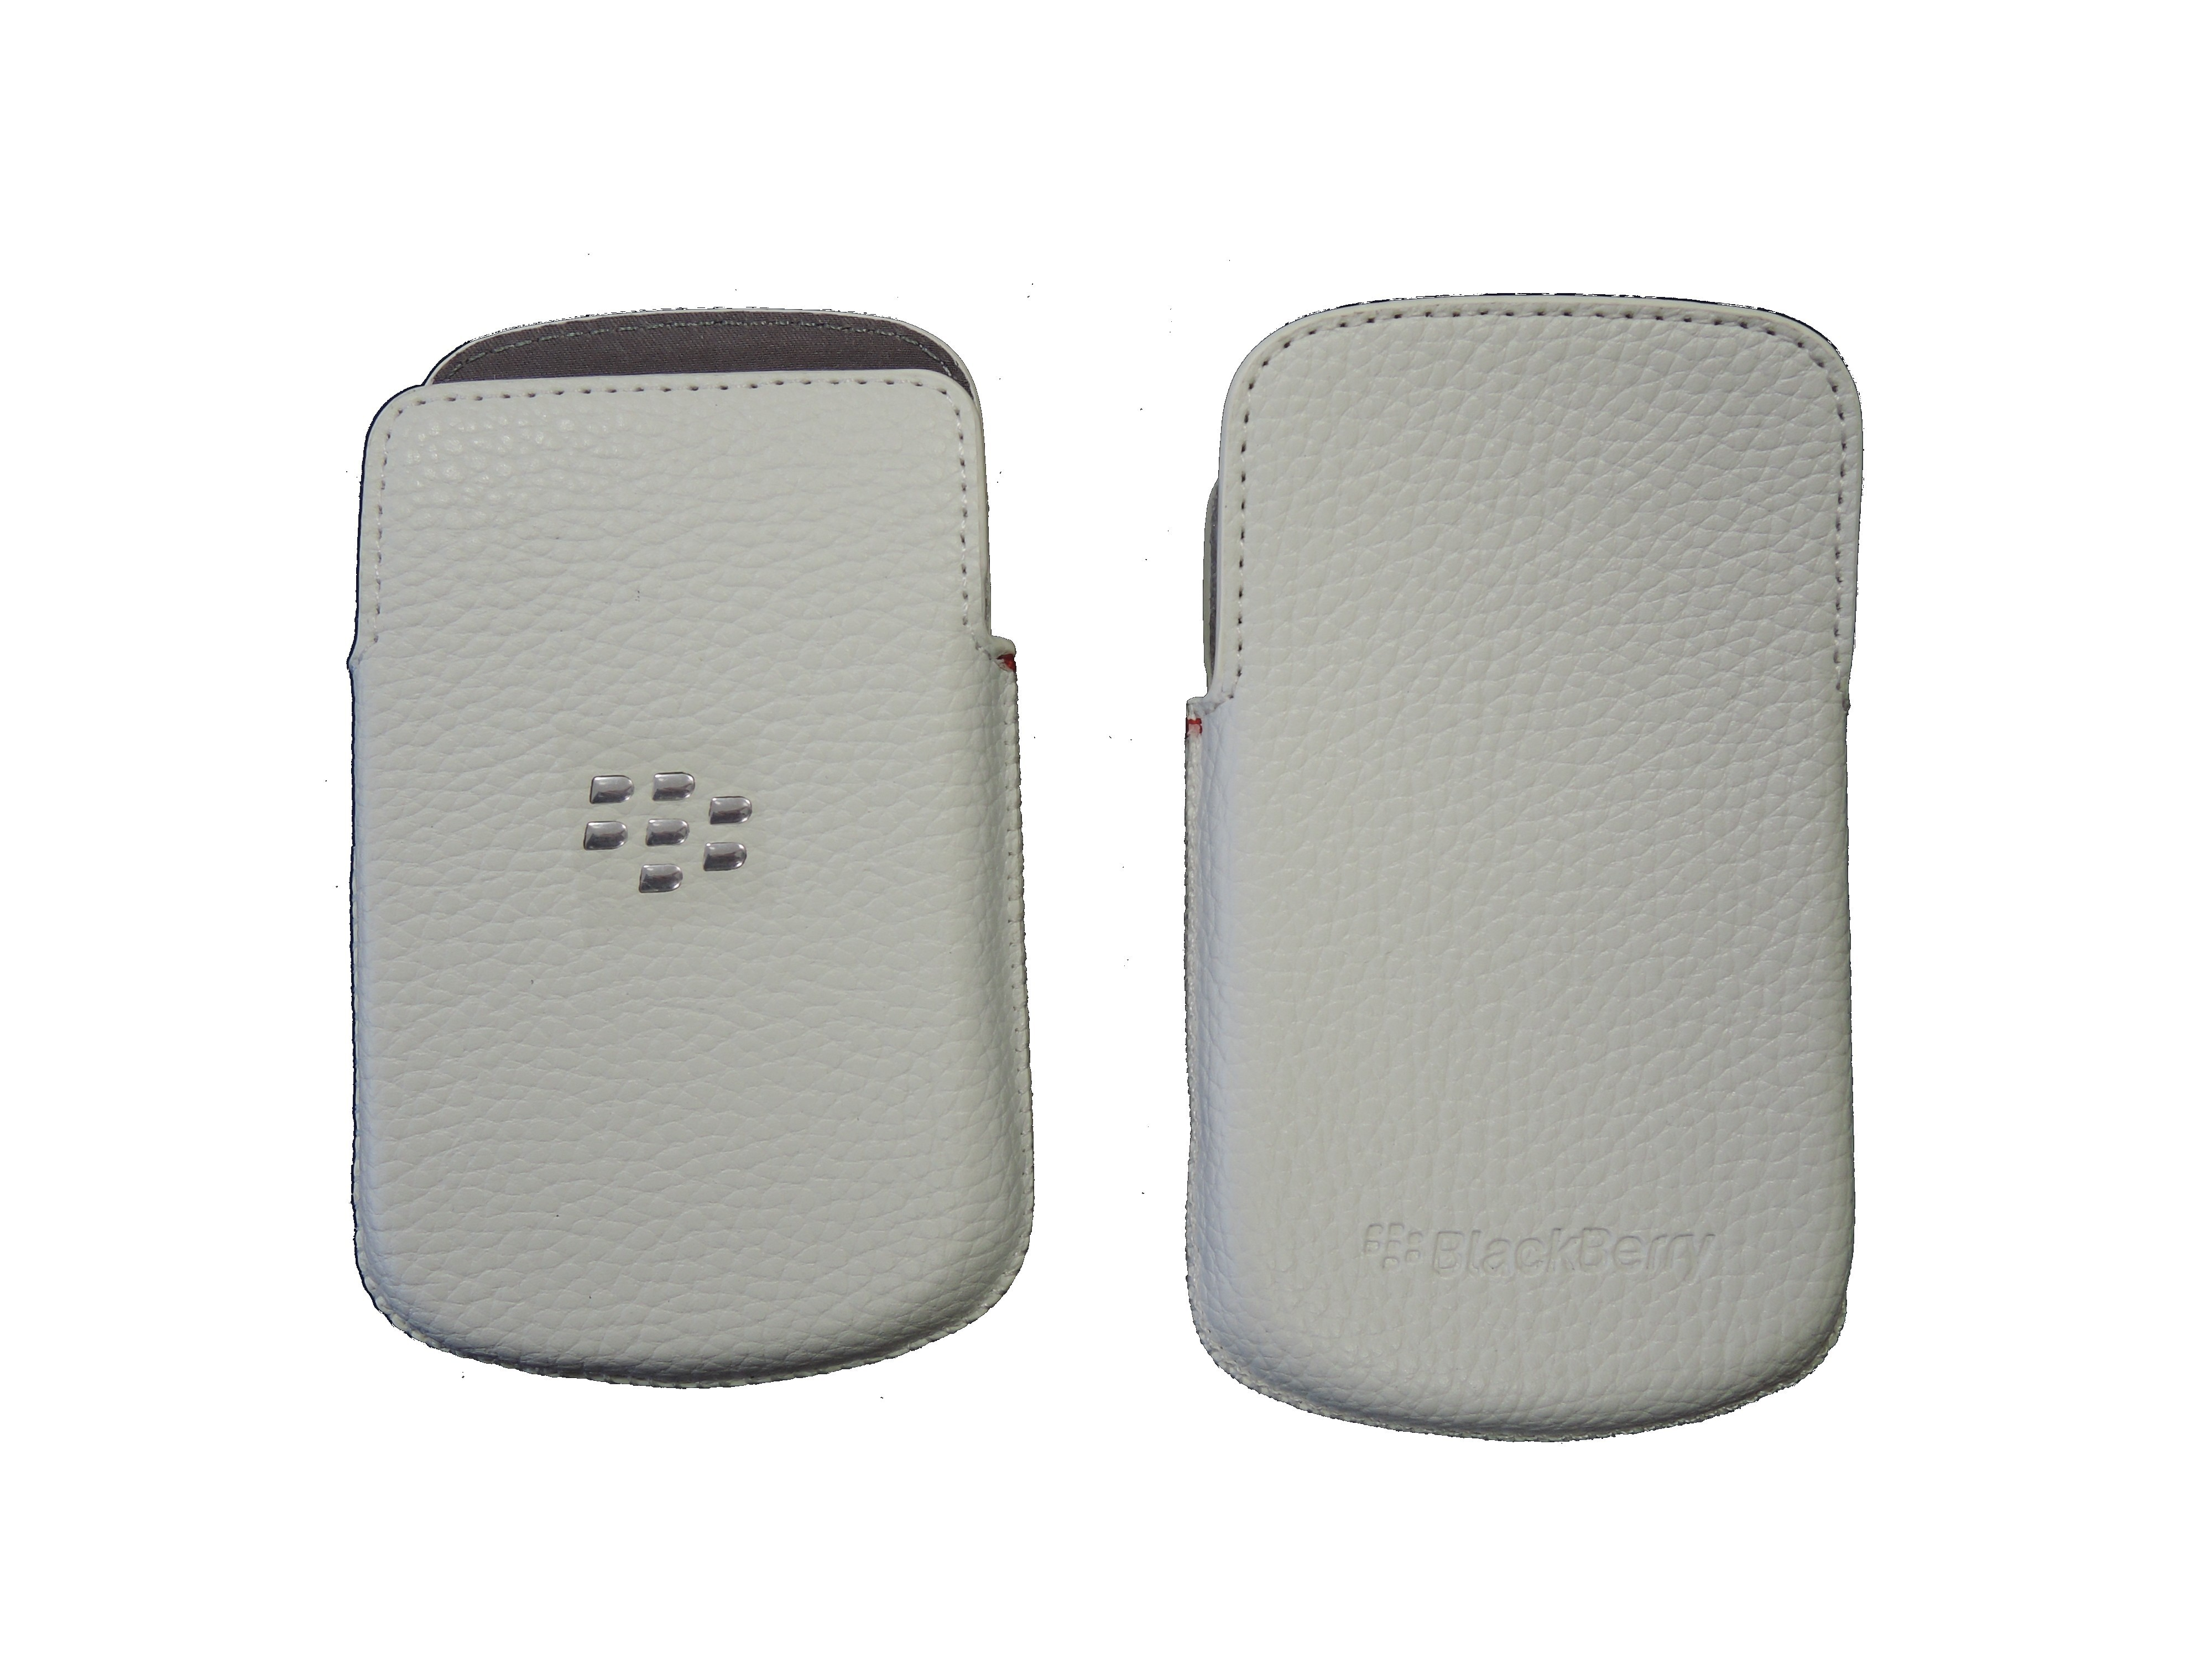 Etui ceinture en cuir noir Blackberry Bold 9900 f13524575a5